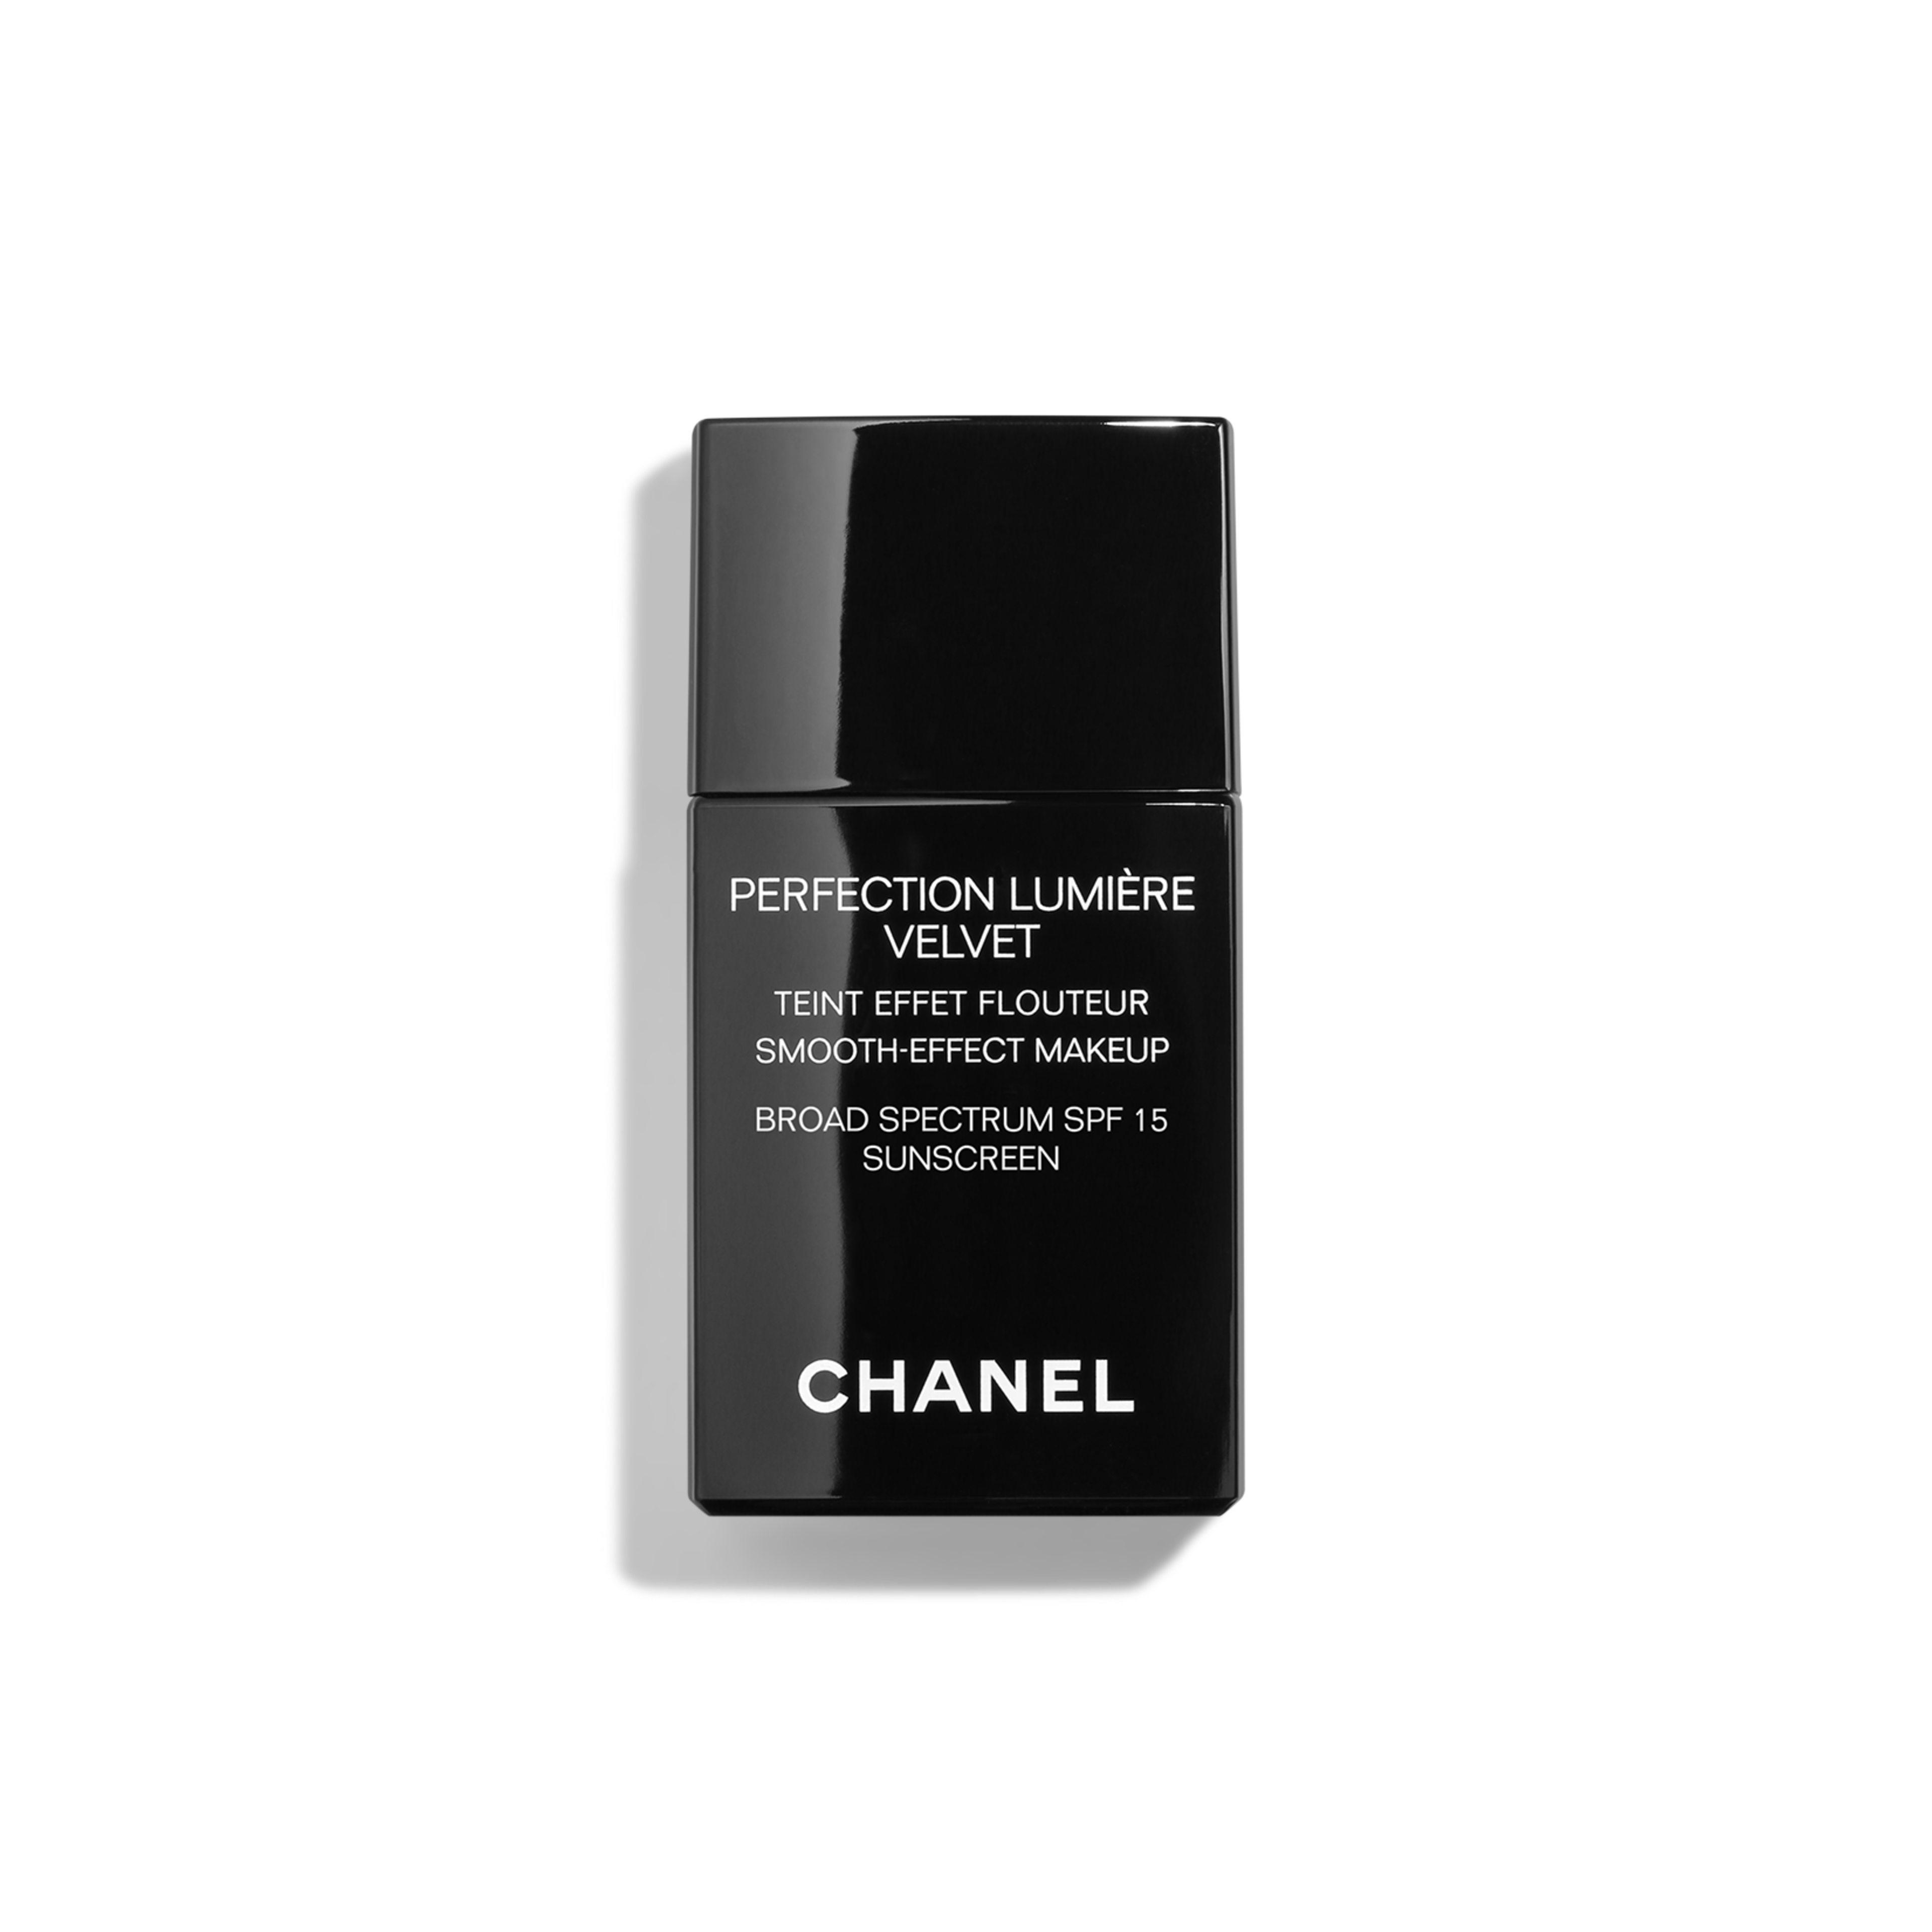 fb8a1cf58 PERFECTION LUMIÈRE VELVET Smooth-Effect Makeup Broad Spectrum SPF 15  Sunscreen Ref. 147726